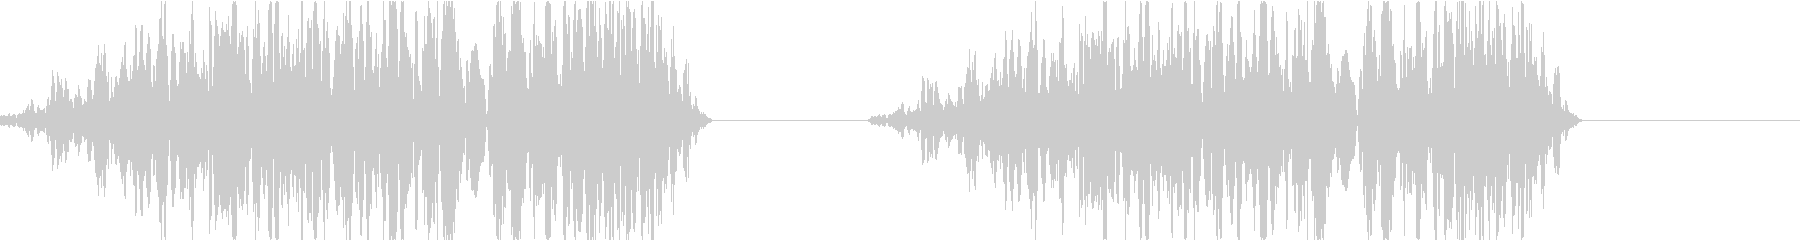 DJプレイ スクラッチ・ノイズ 204の未再生の波形